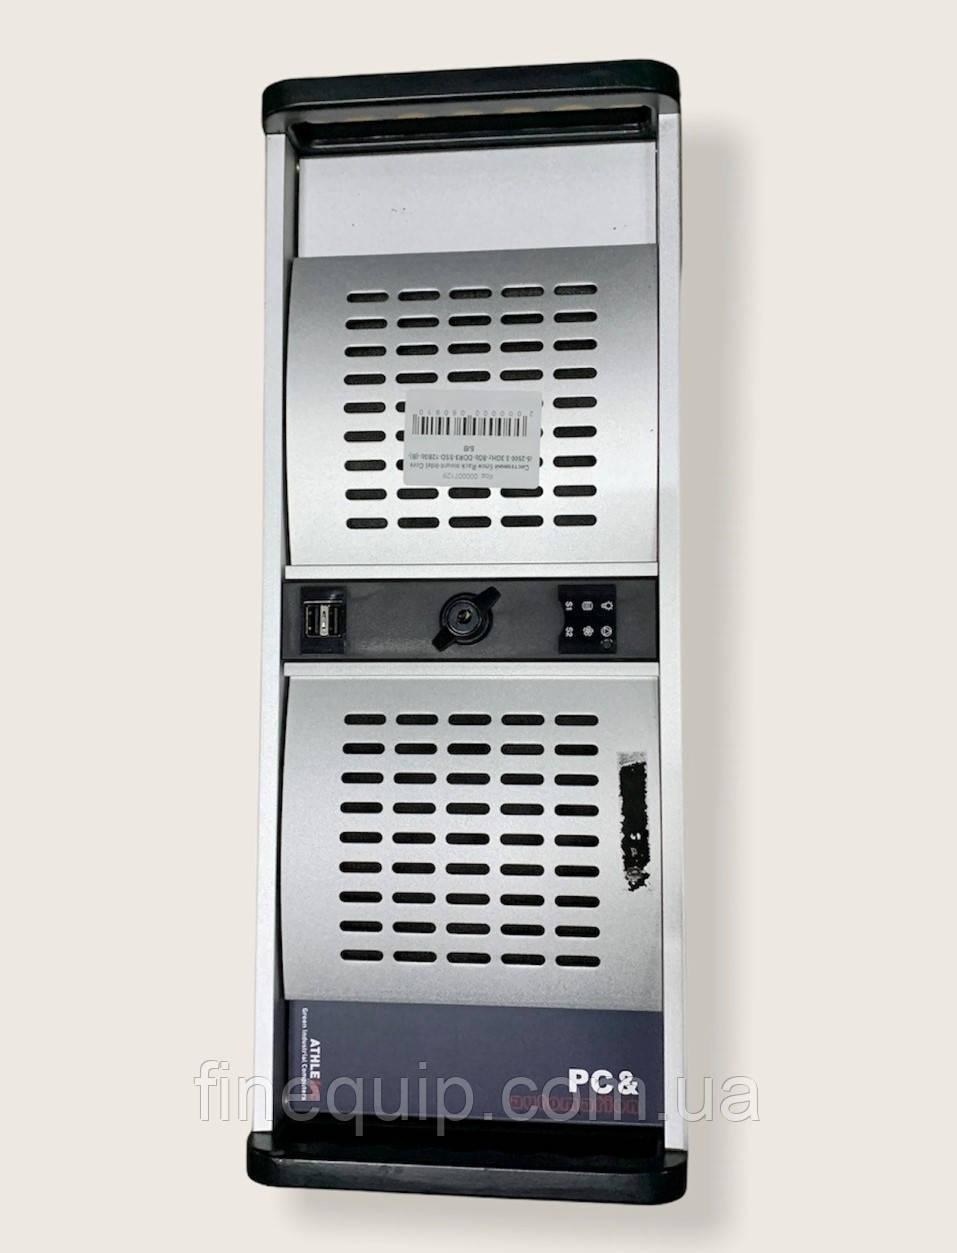 Системный блок-Rack mount-Intel Core i3-2130-3.4GHz-8Gb-DDR3-HDD-500Gb-(B)- Б/У